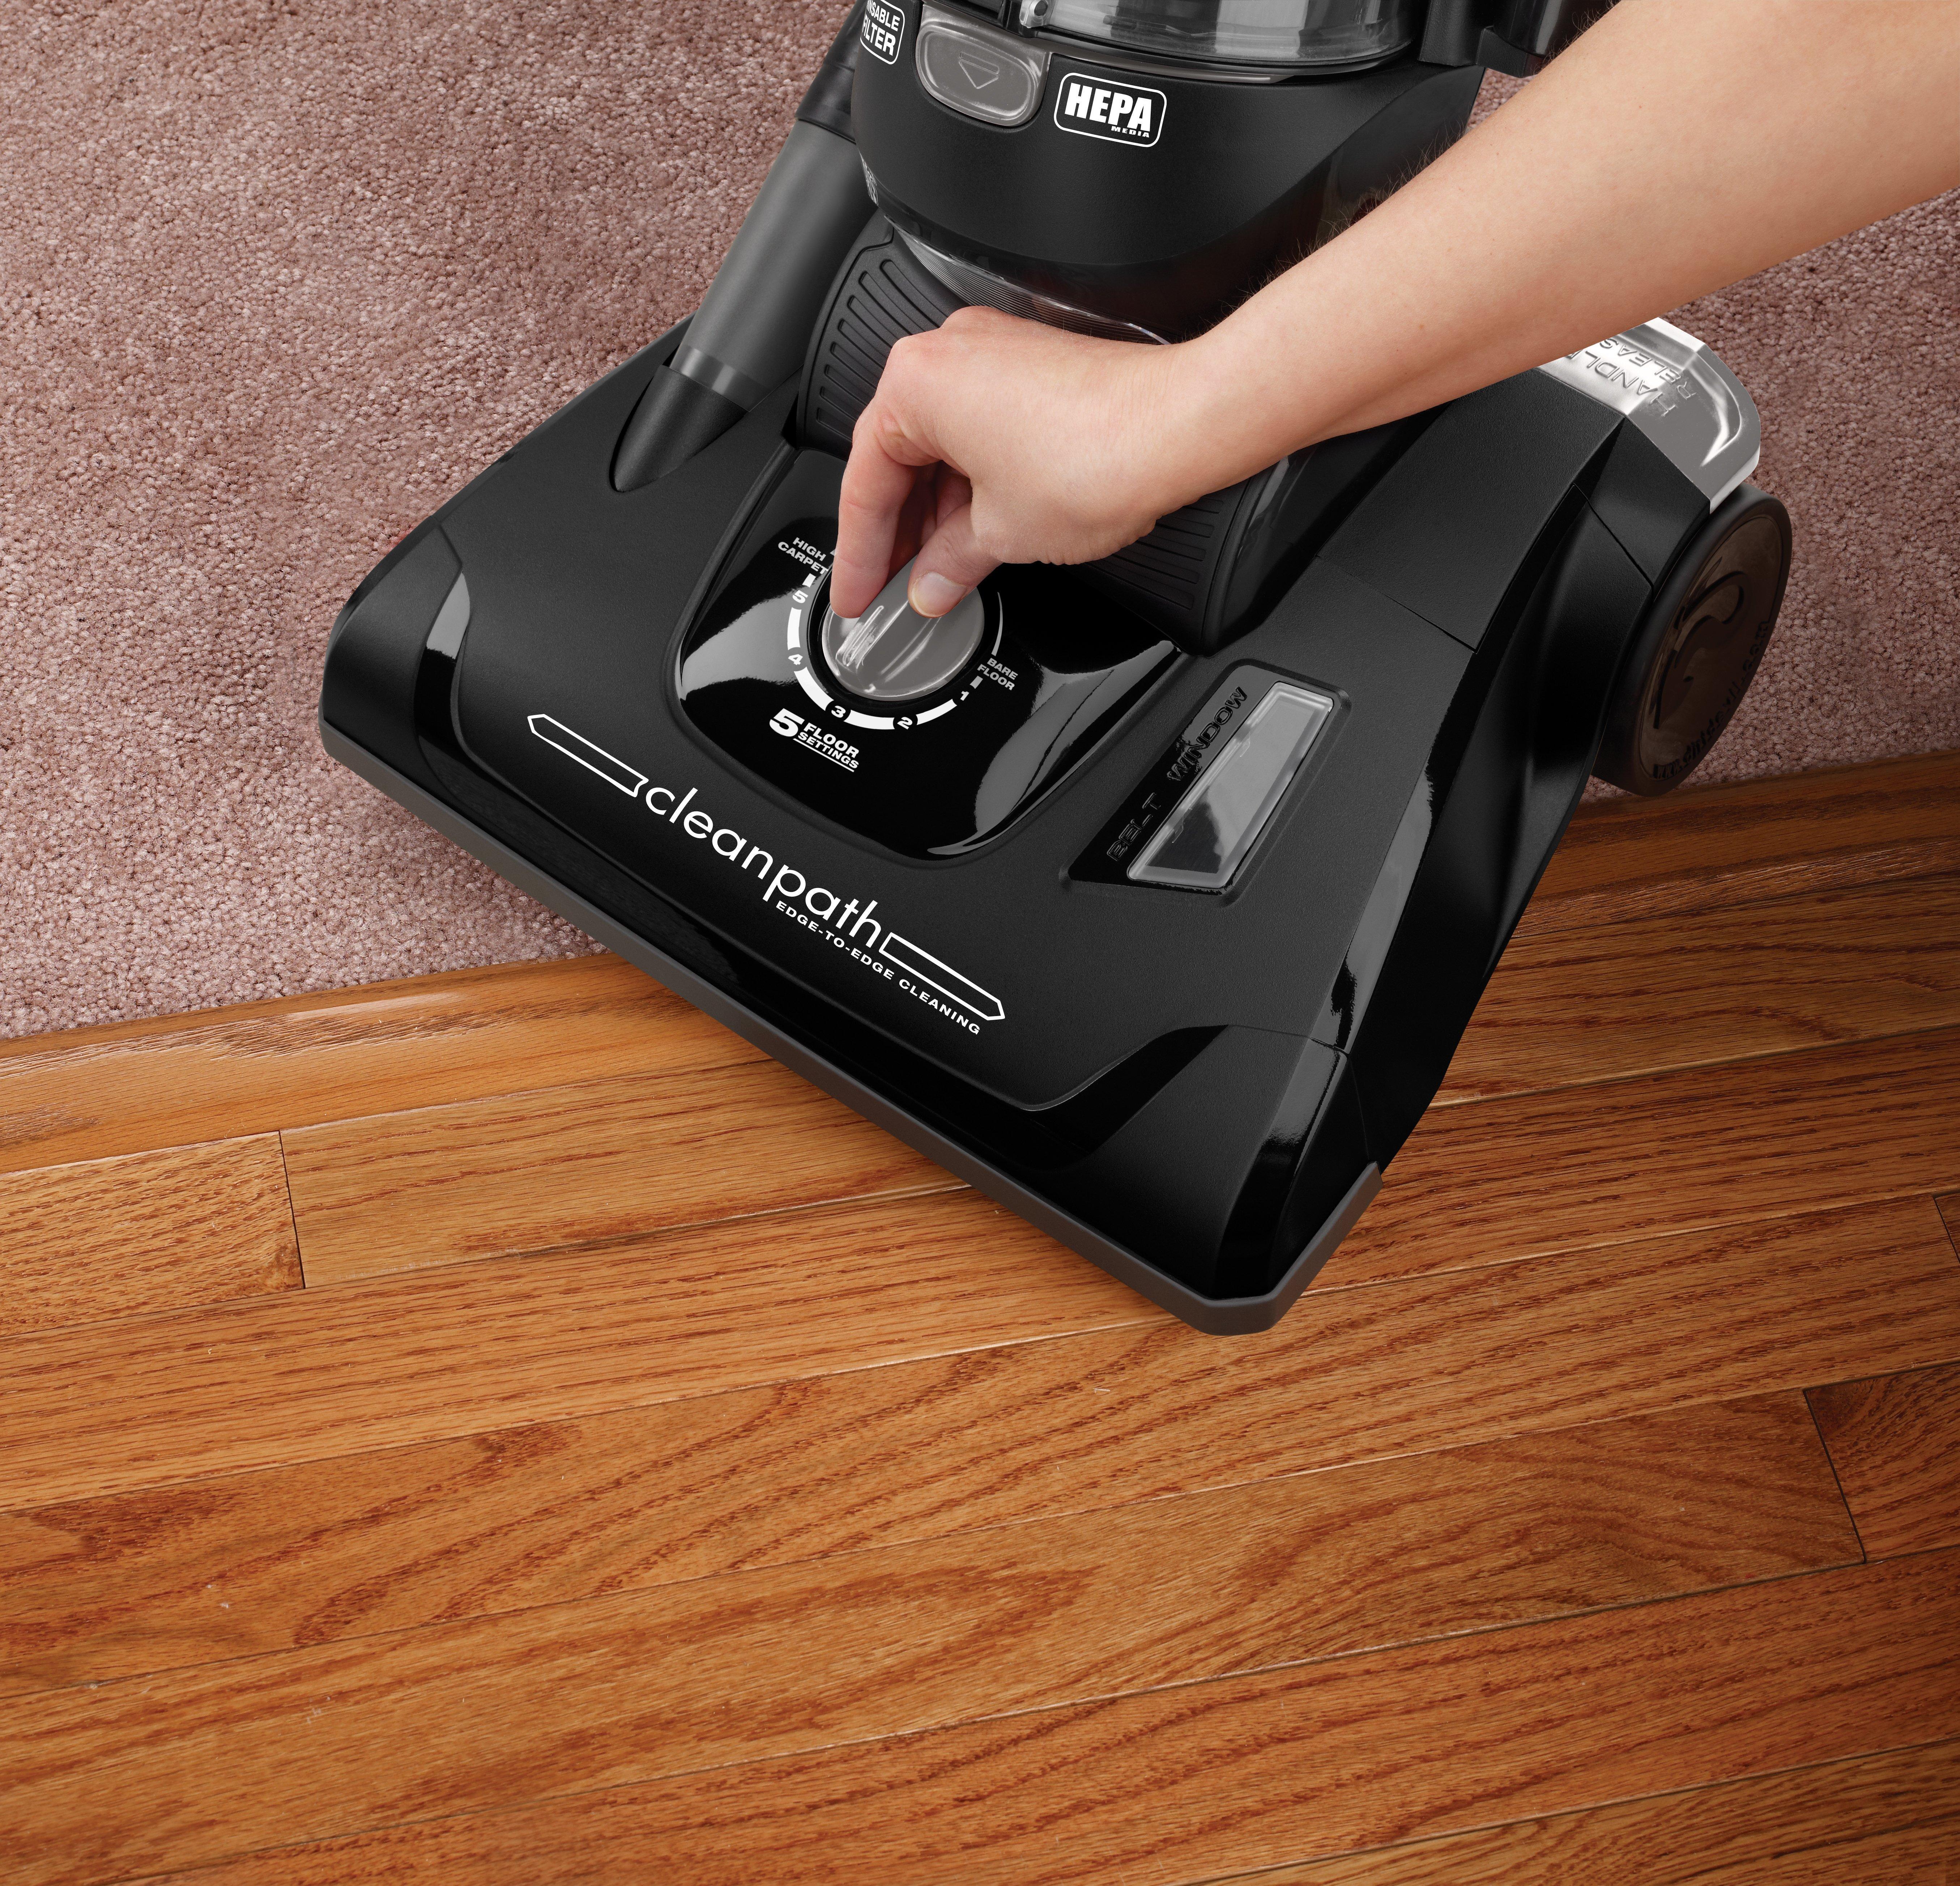 Dirt-Devil-Vigor-Pet-Cyclonic-Bagless-Upright-Vacuum-Cleaner-UD70222 thumbnail 4